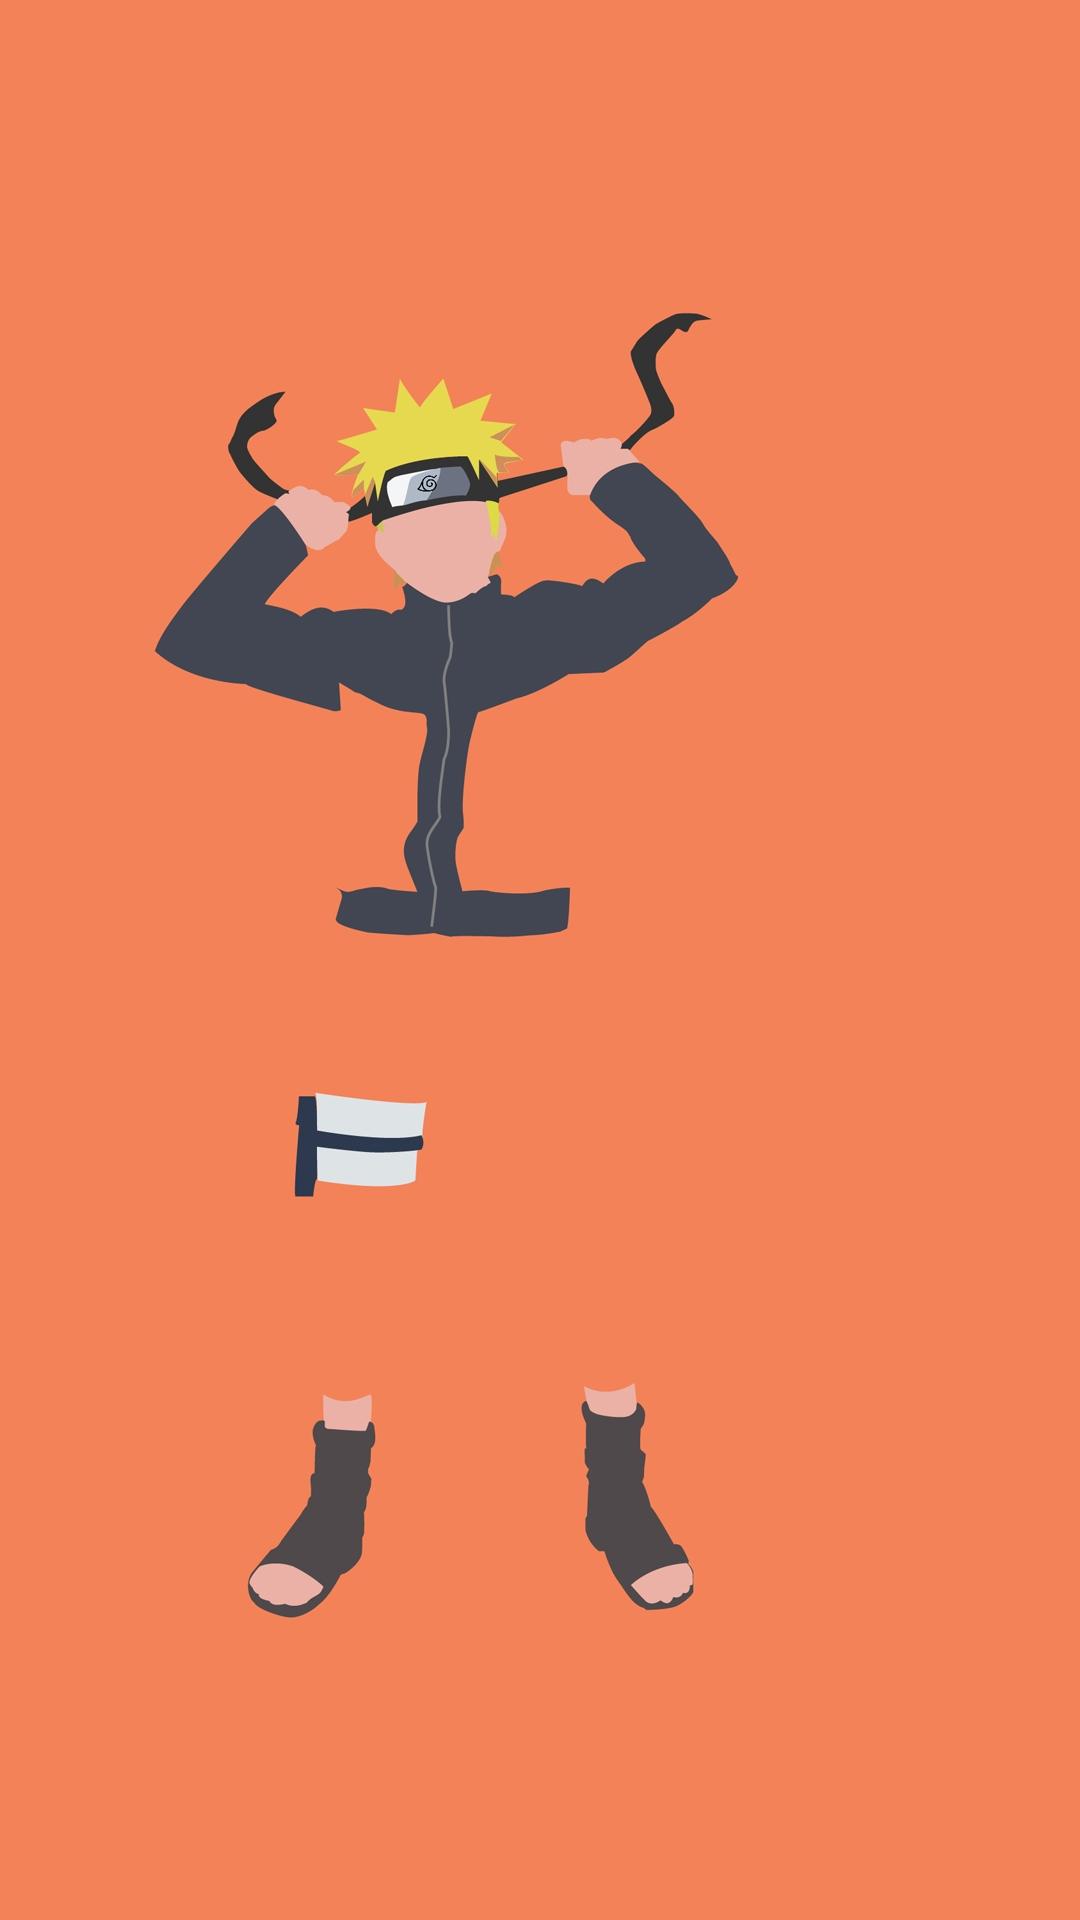 49] Naruto iPhone 7 Plus Wallpaper on WallpaperSafari 1080x1920